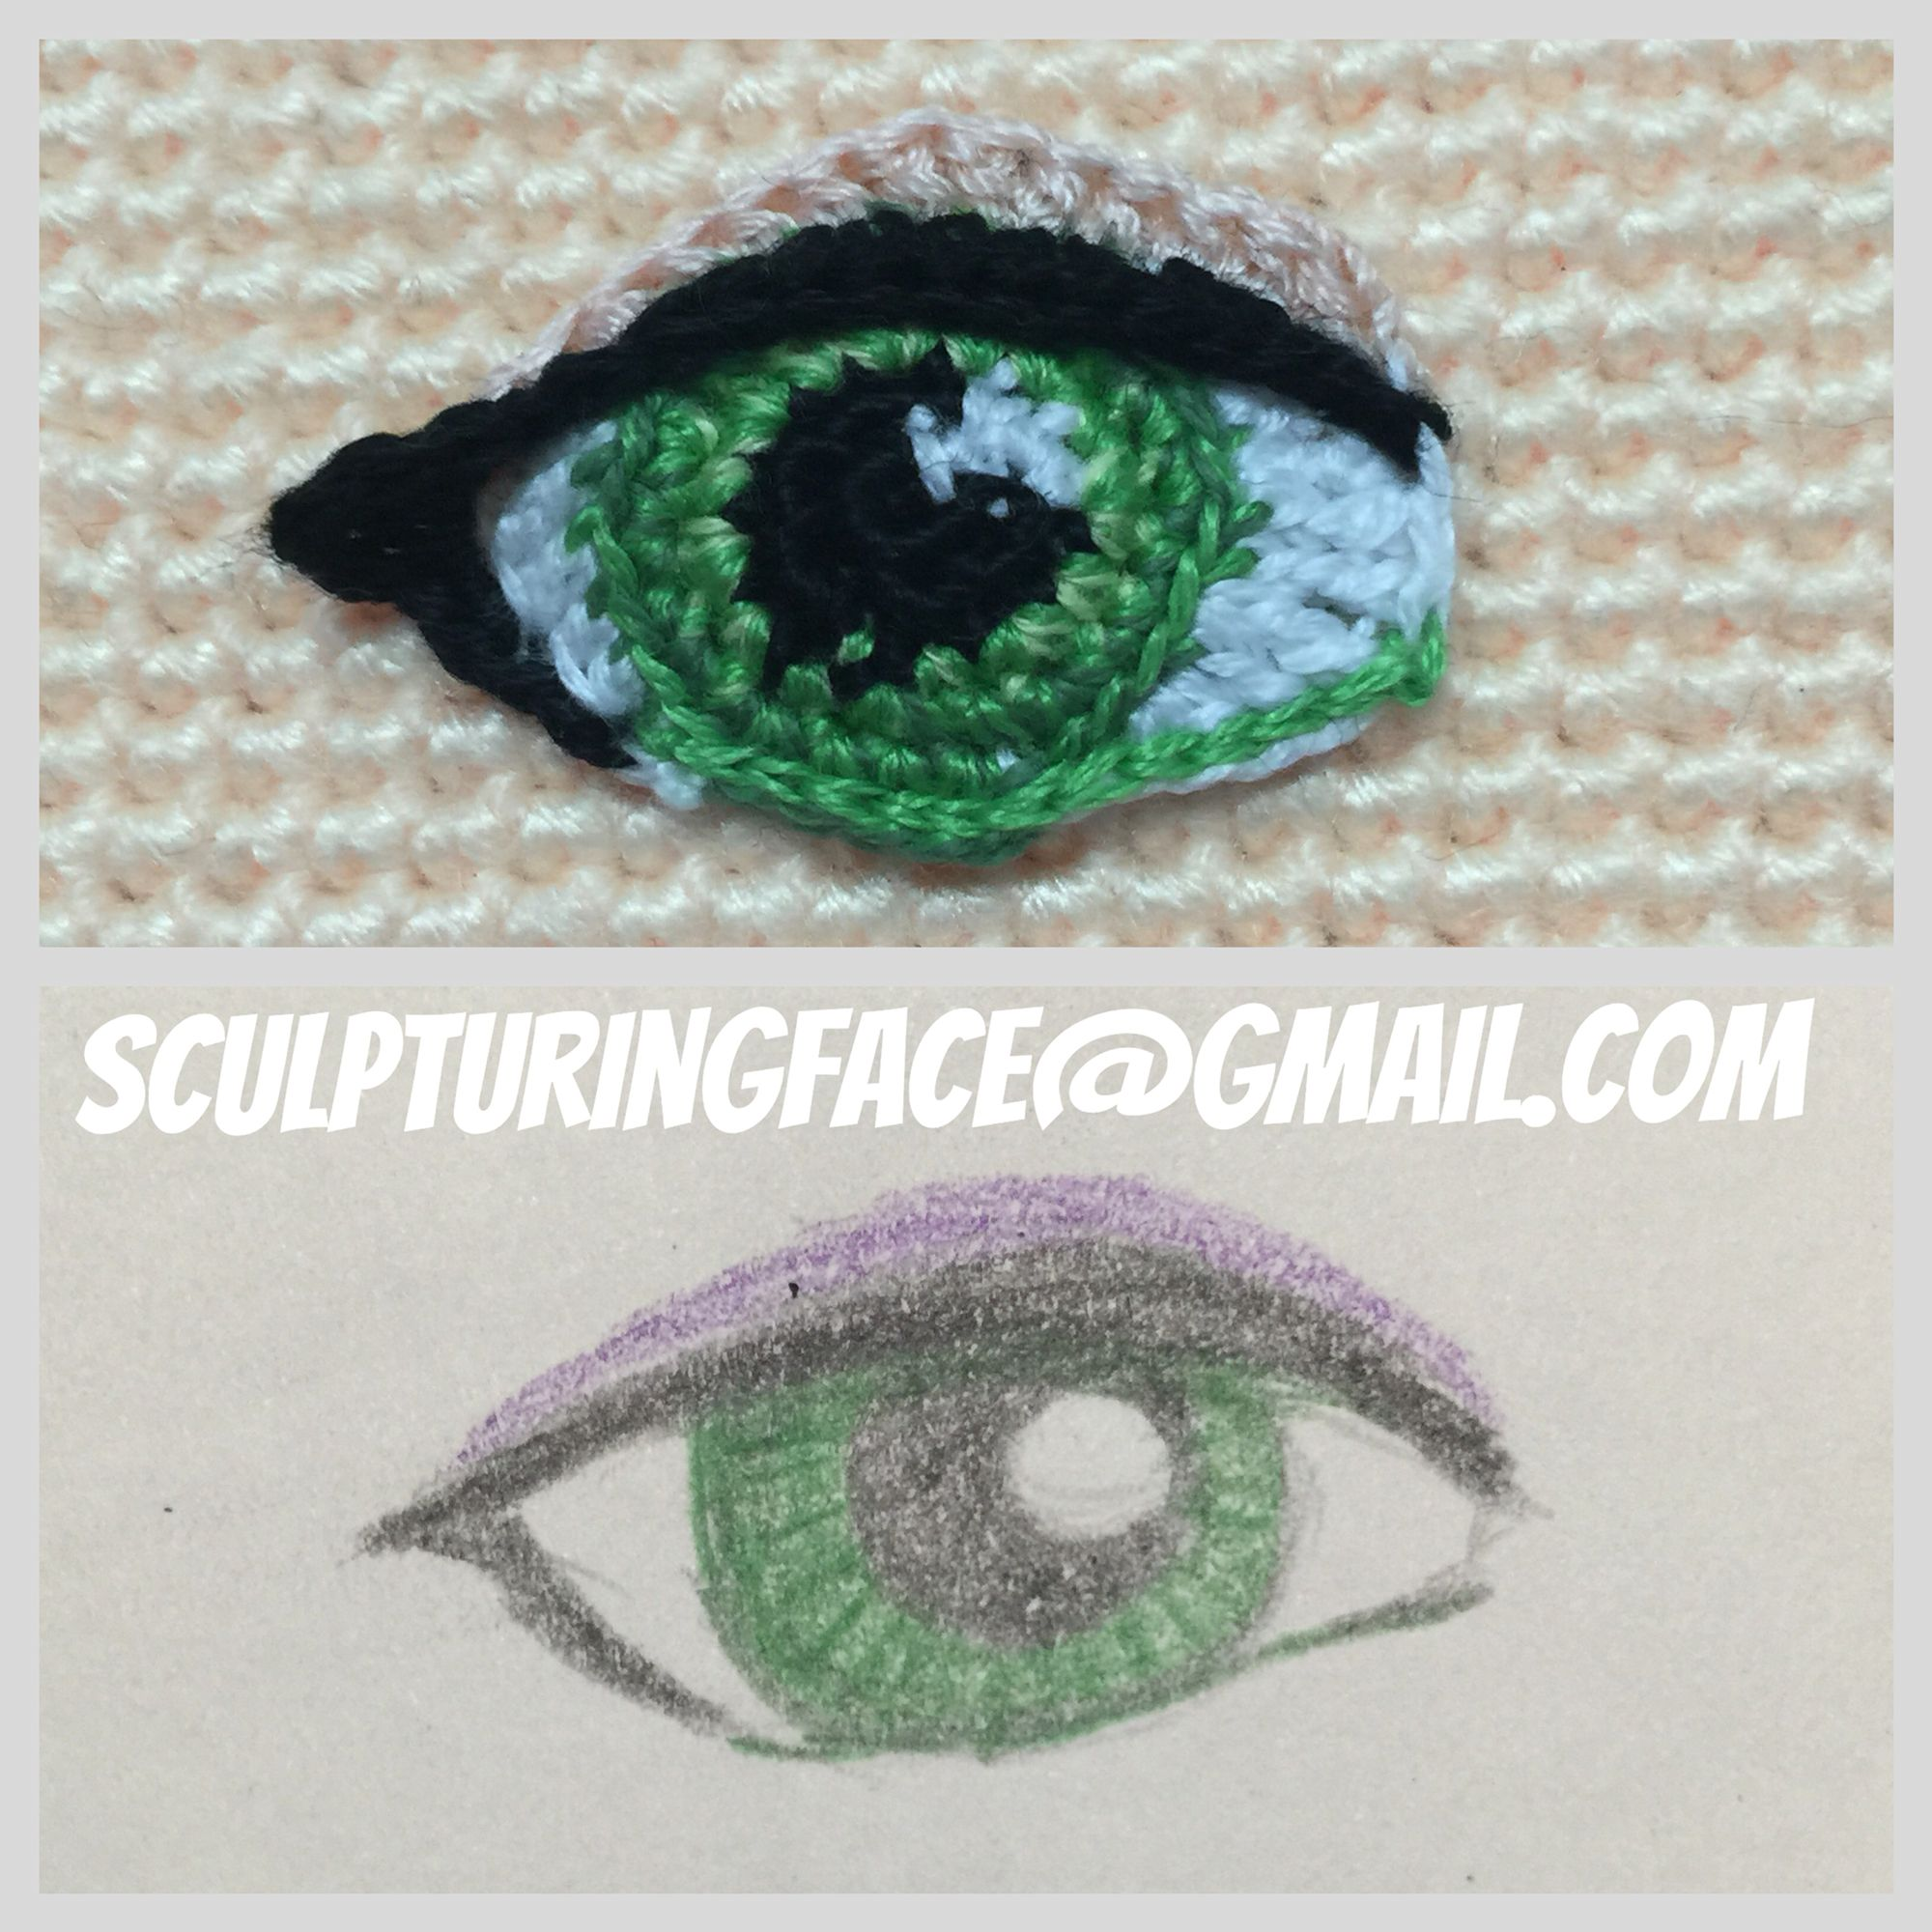 Amigurumi Eyelashes : My crocheted Amigurumi eye by Sculpturingface@gmail.com ...